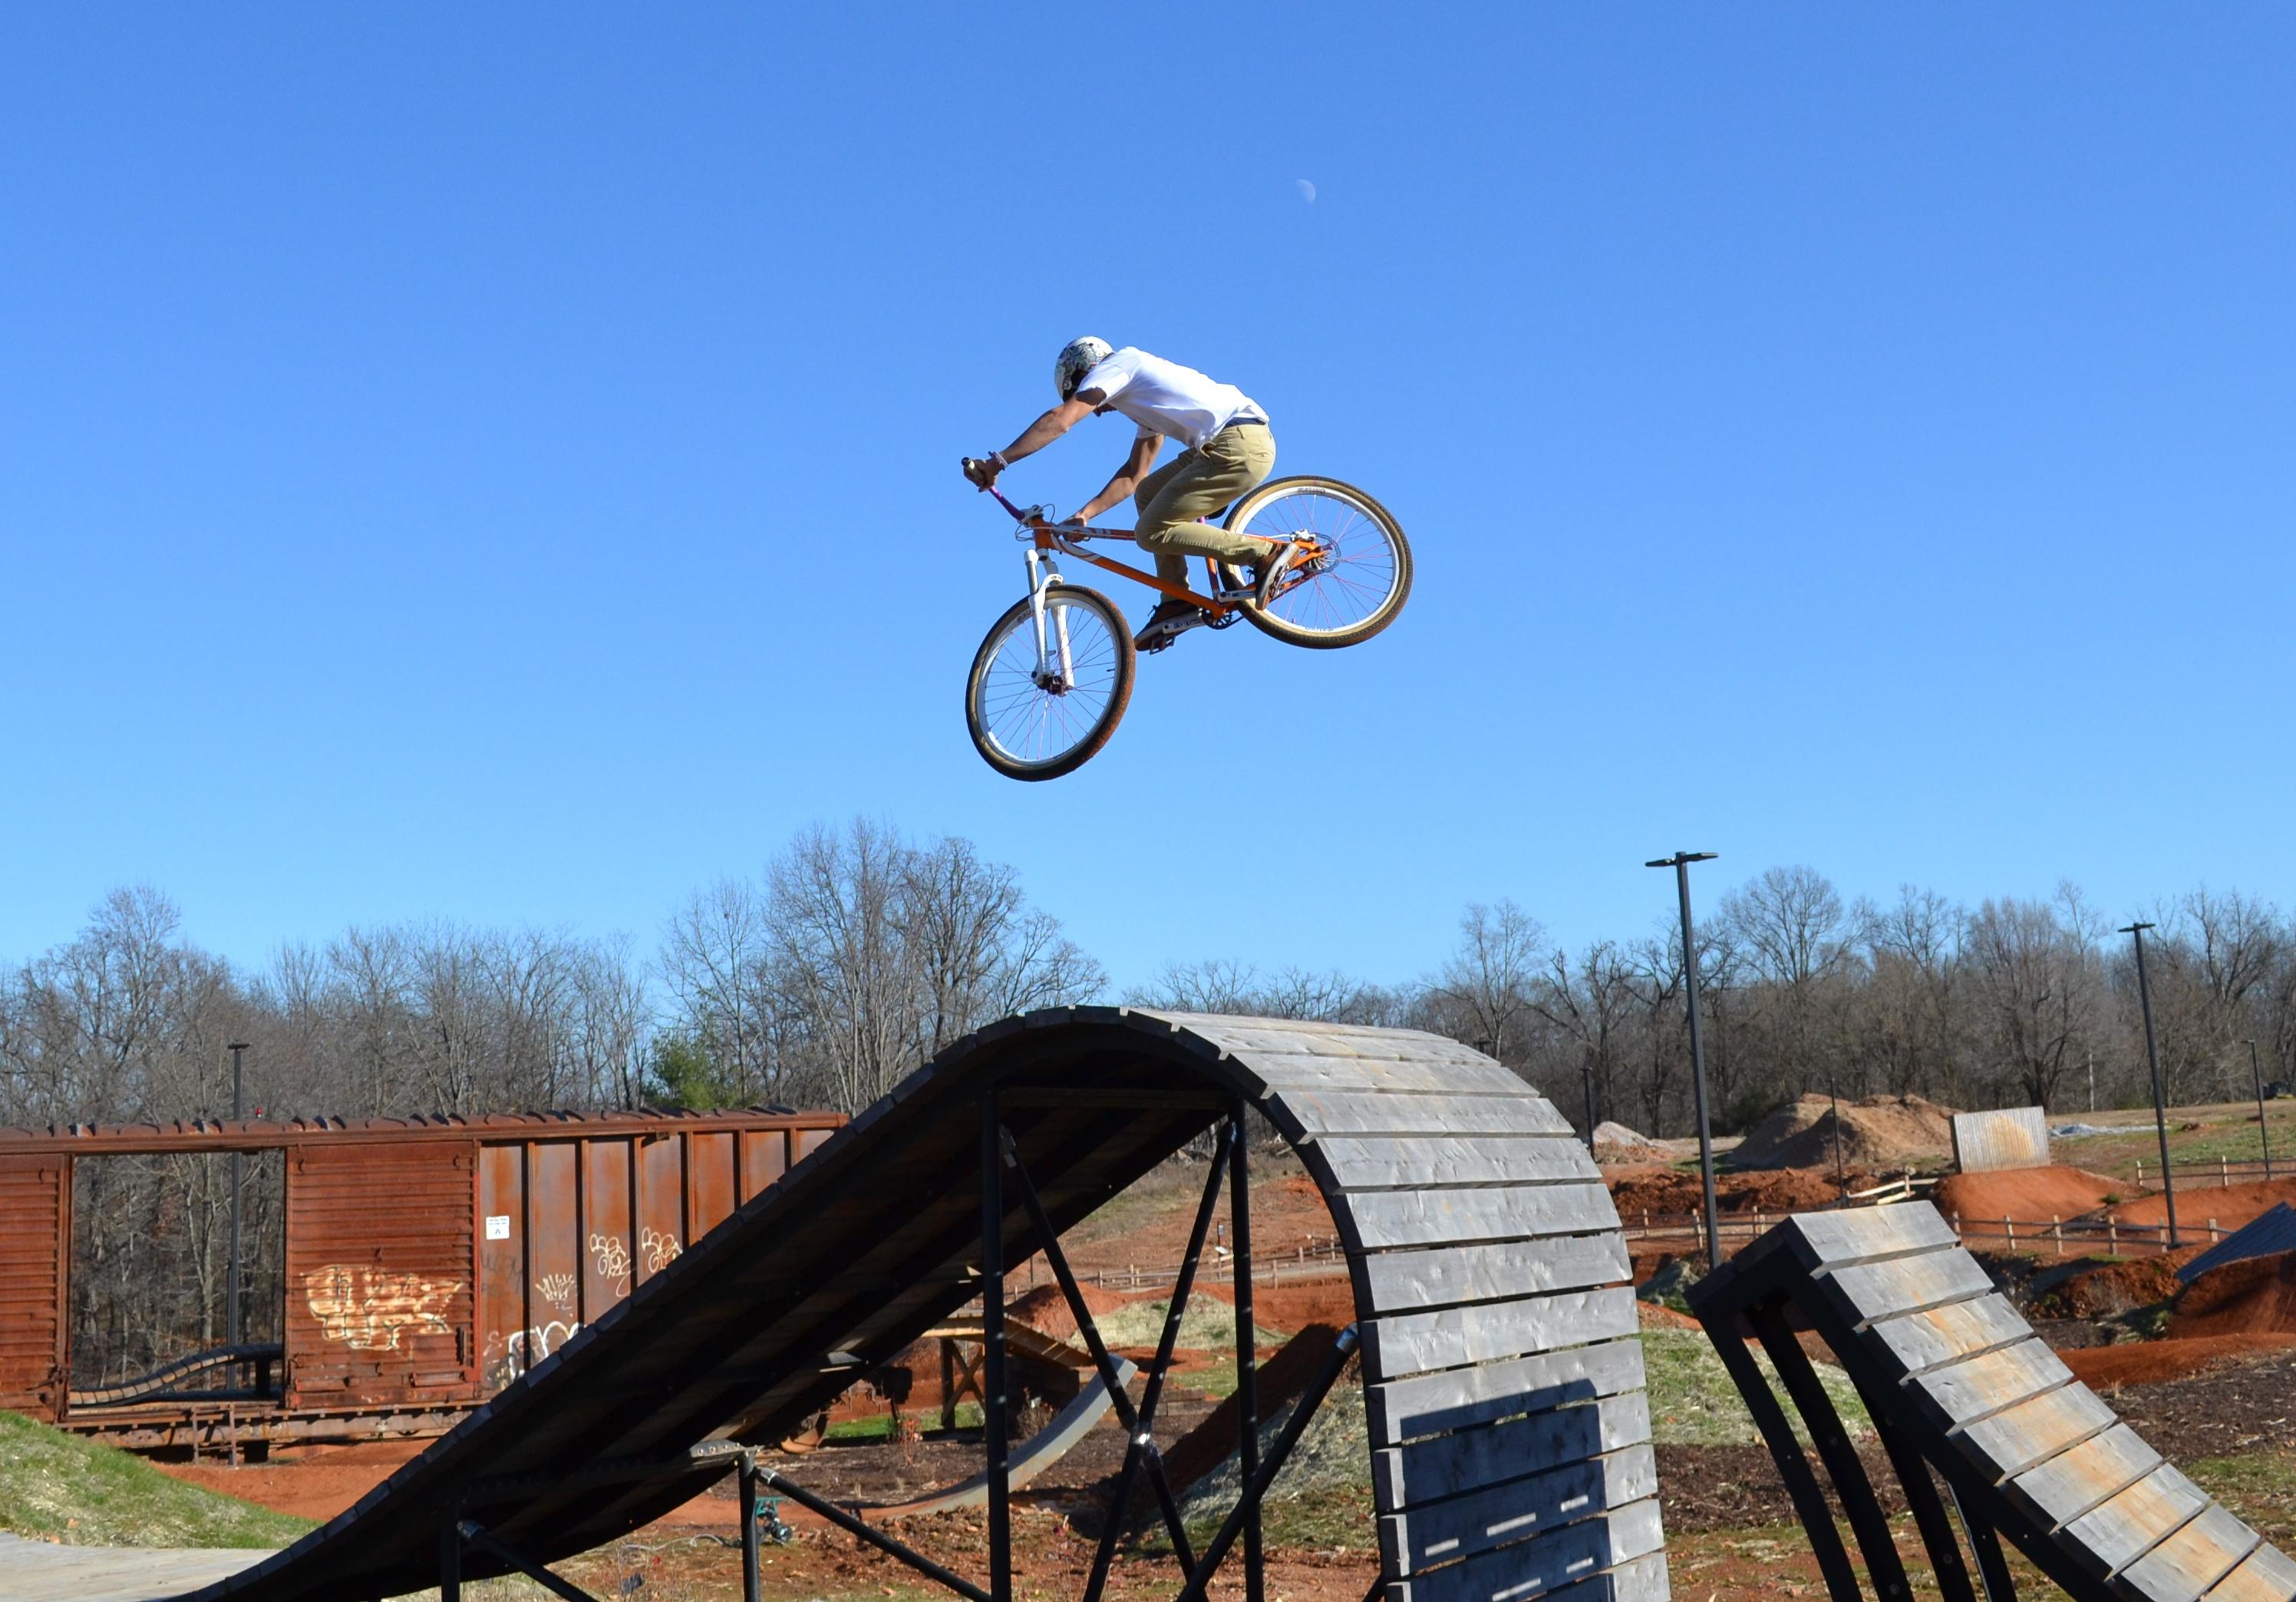 Railyard_Bike_Park_004